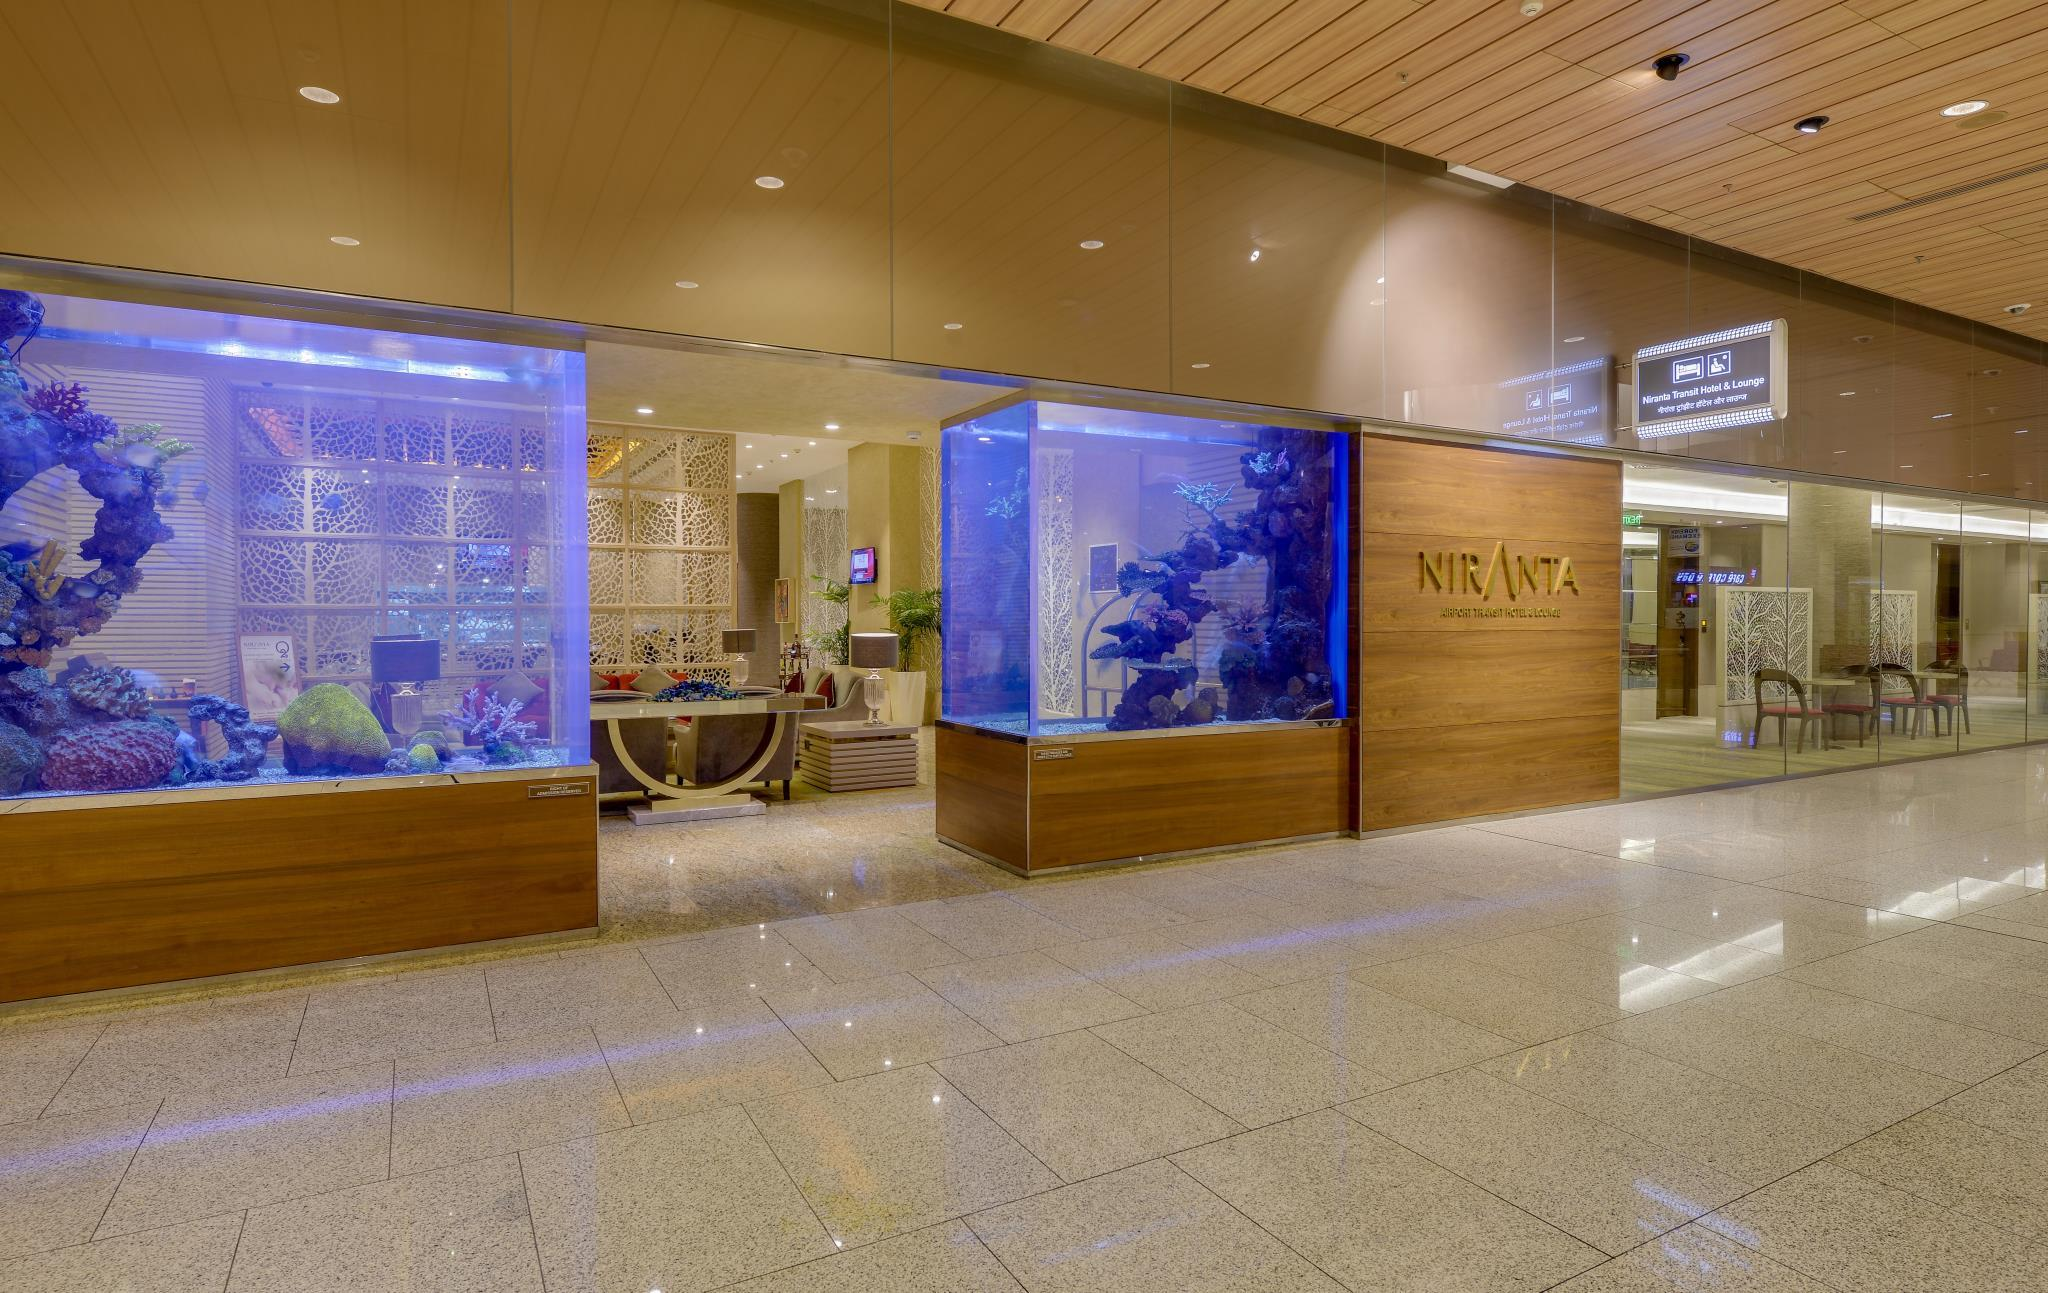 Niranta Airport Transit Hotel & Lounge Terminal 2 Arrivals/Landside